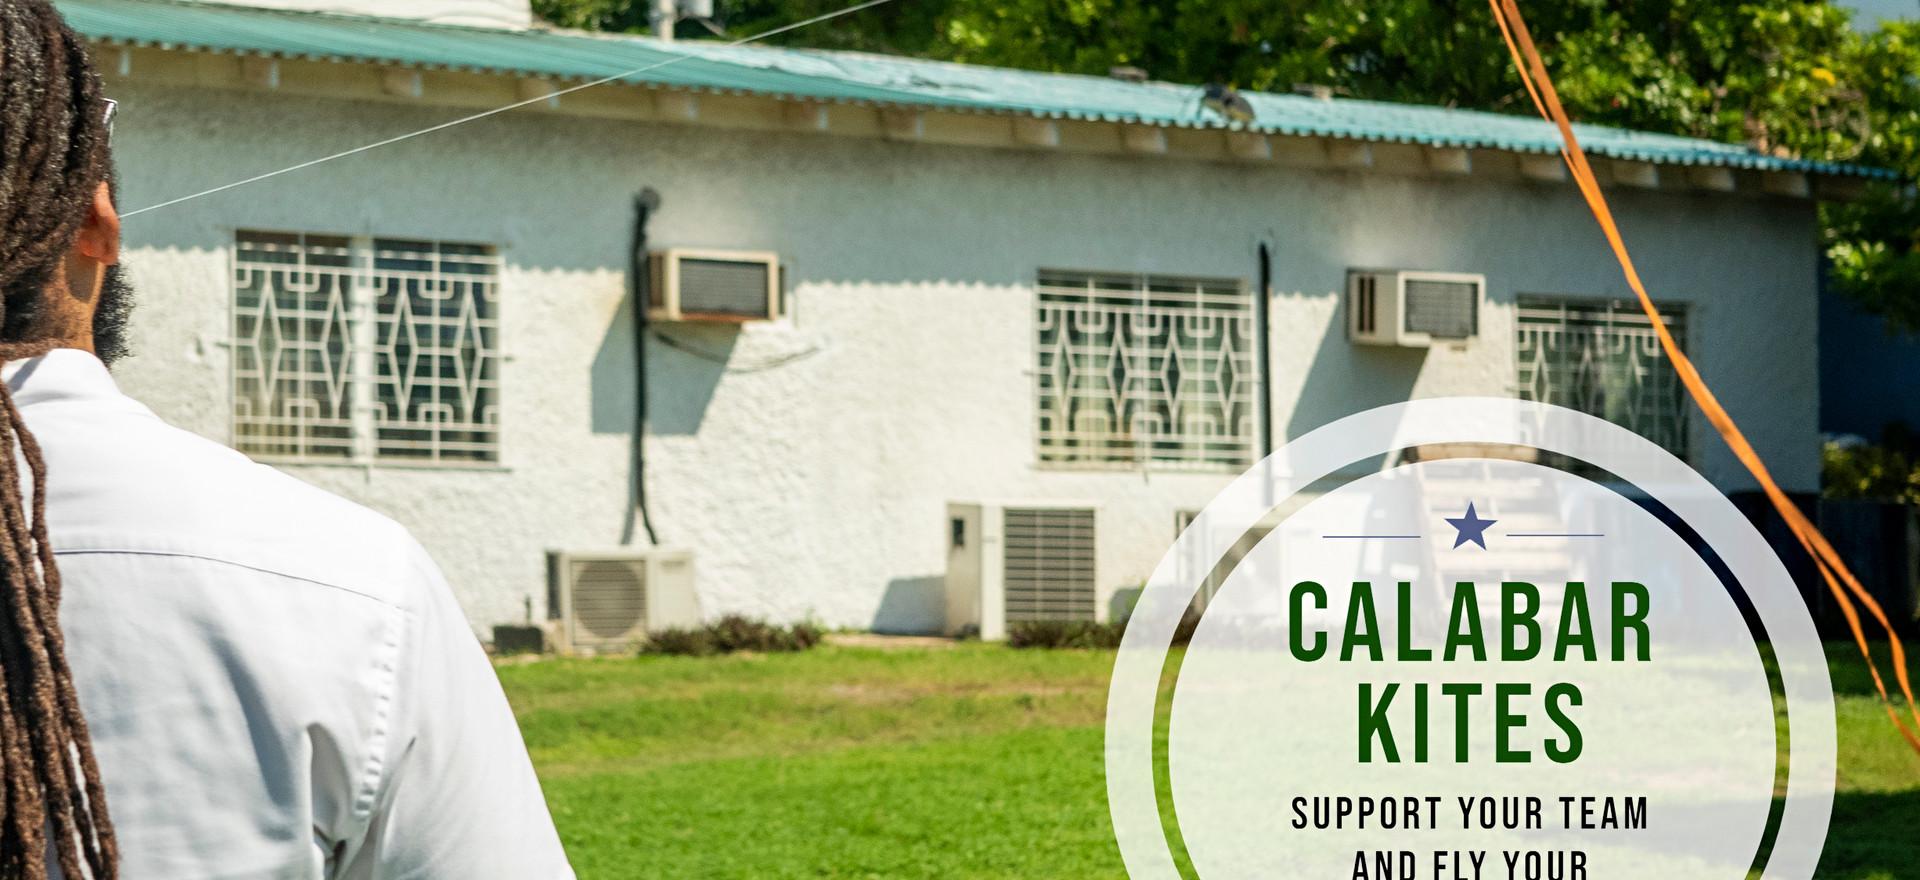 Branded School Kite promo - Calabar